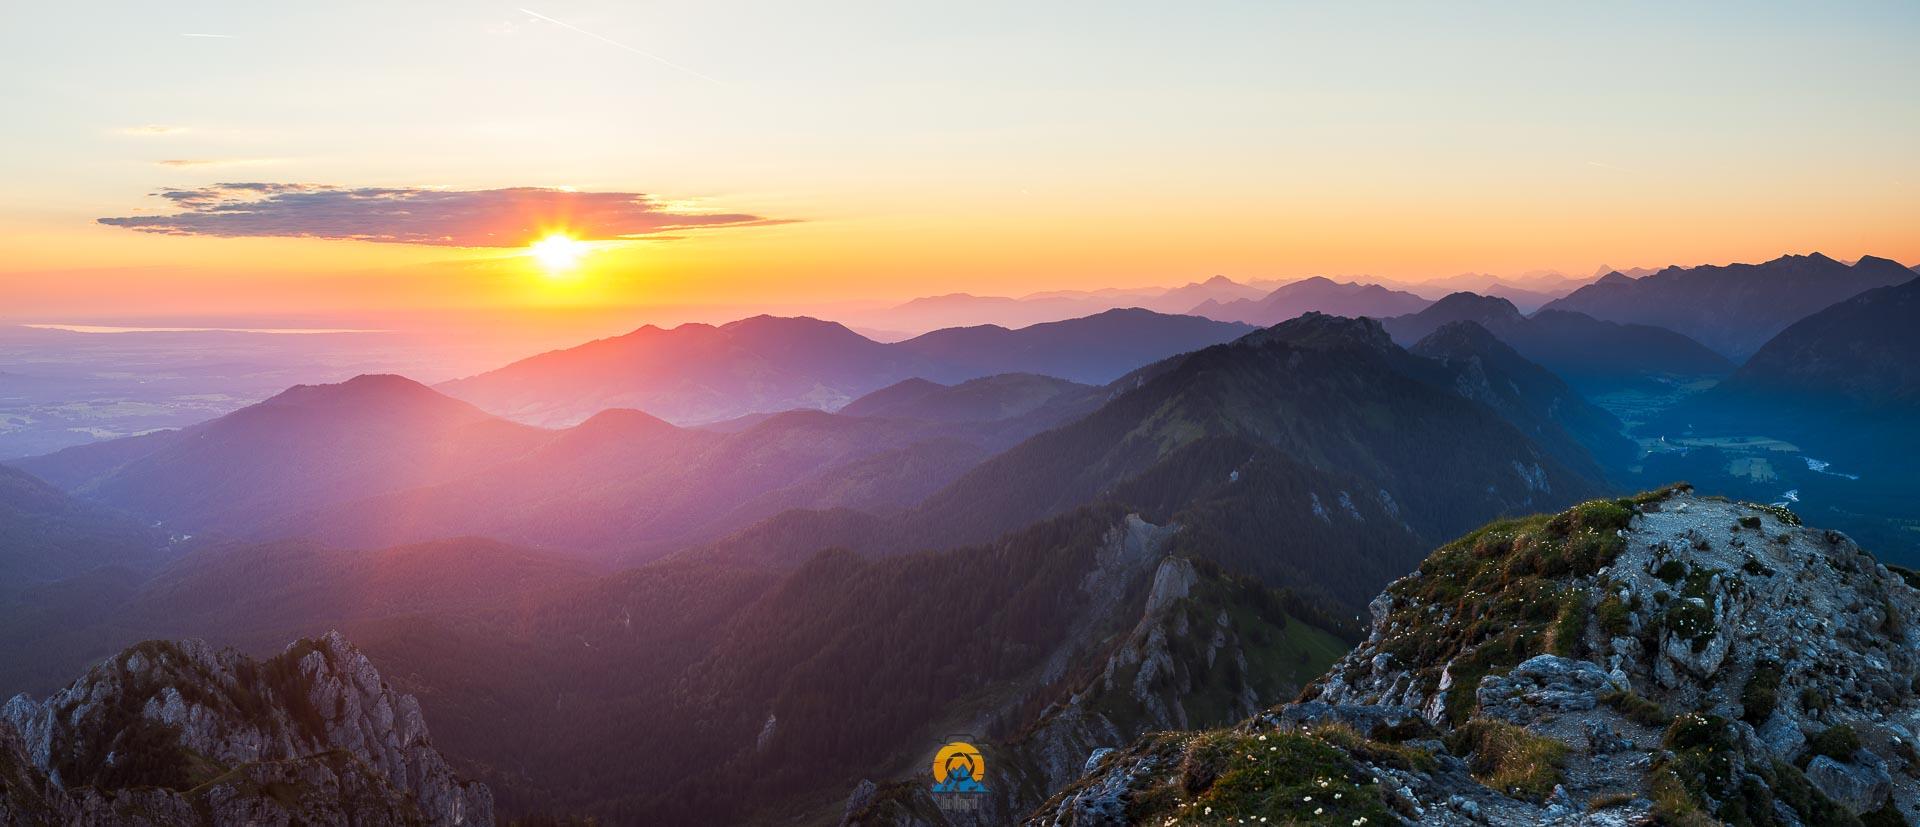 Klammspitze Pano Sonnenaufgang.jpg